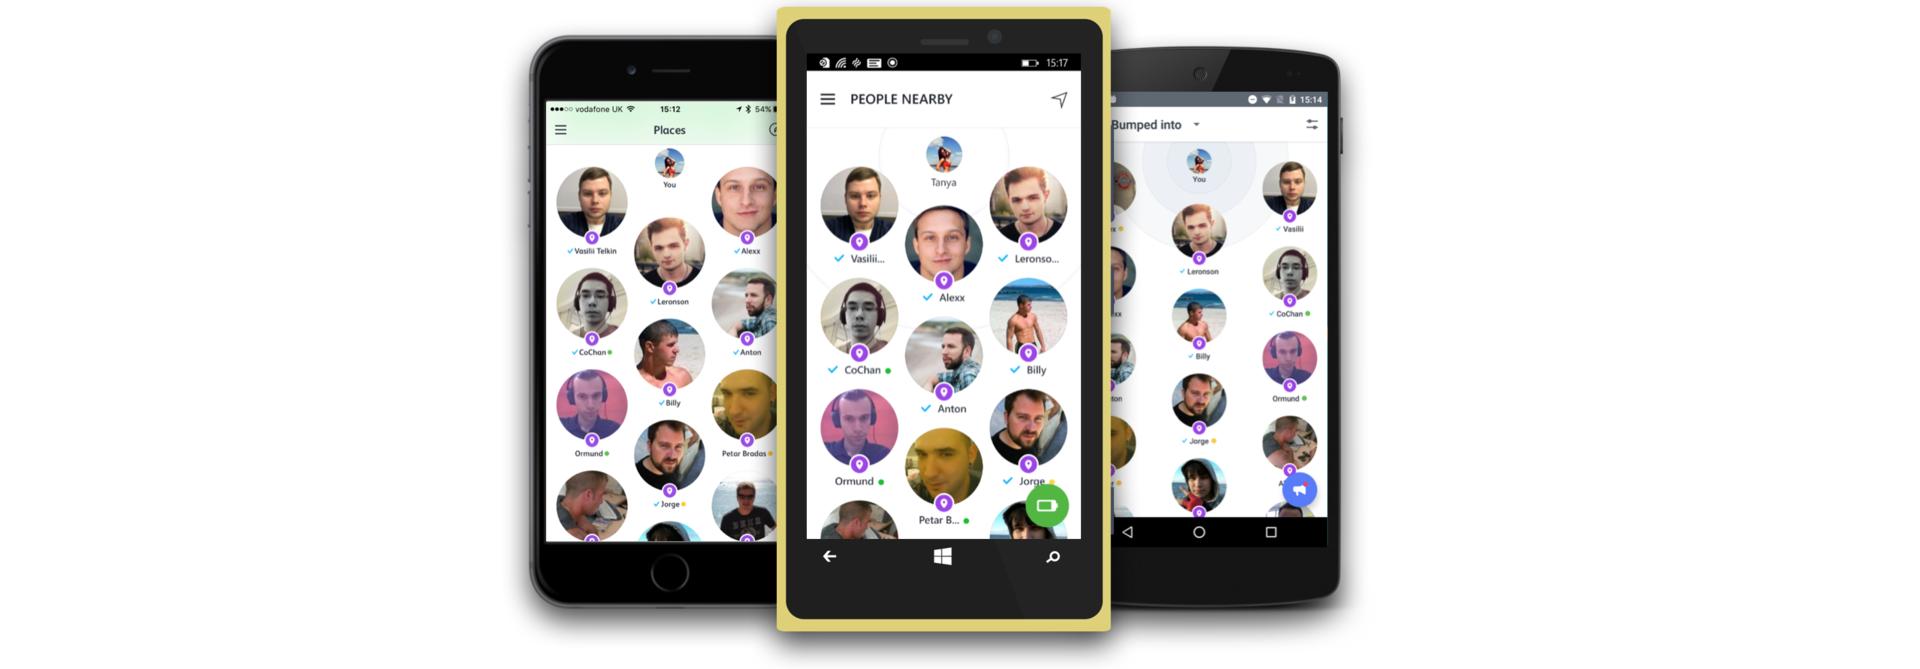 Windows Phone как экспериментальная платформа - 4